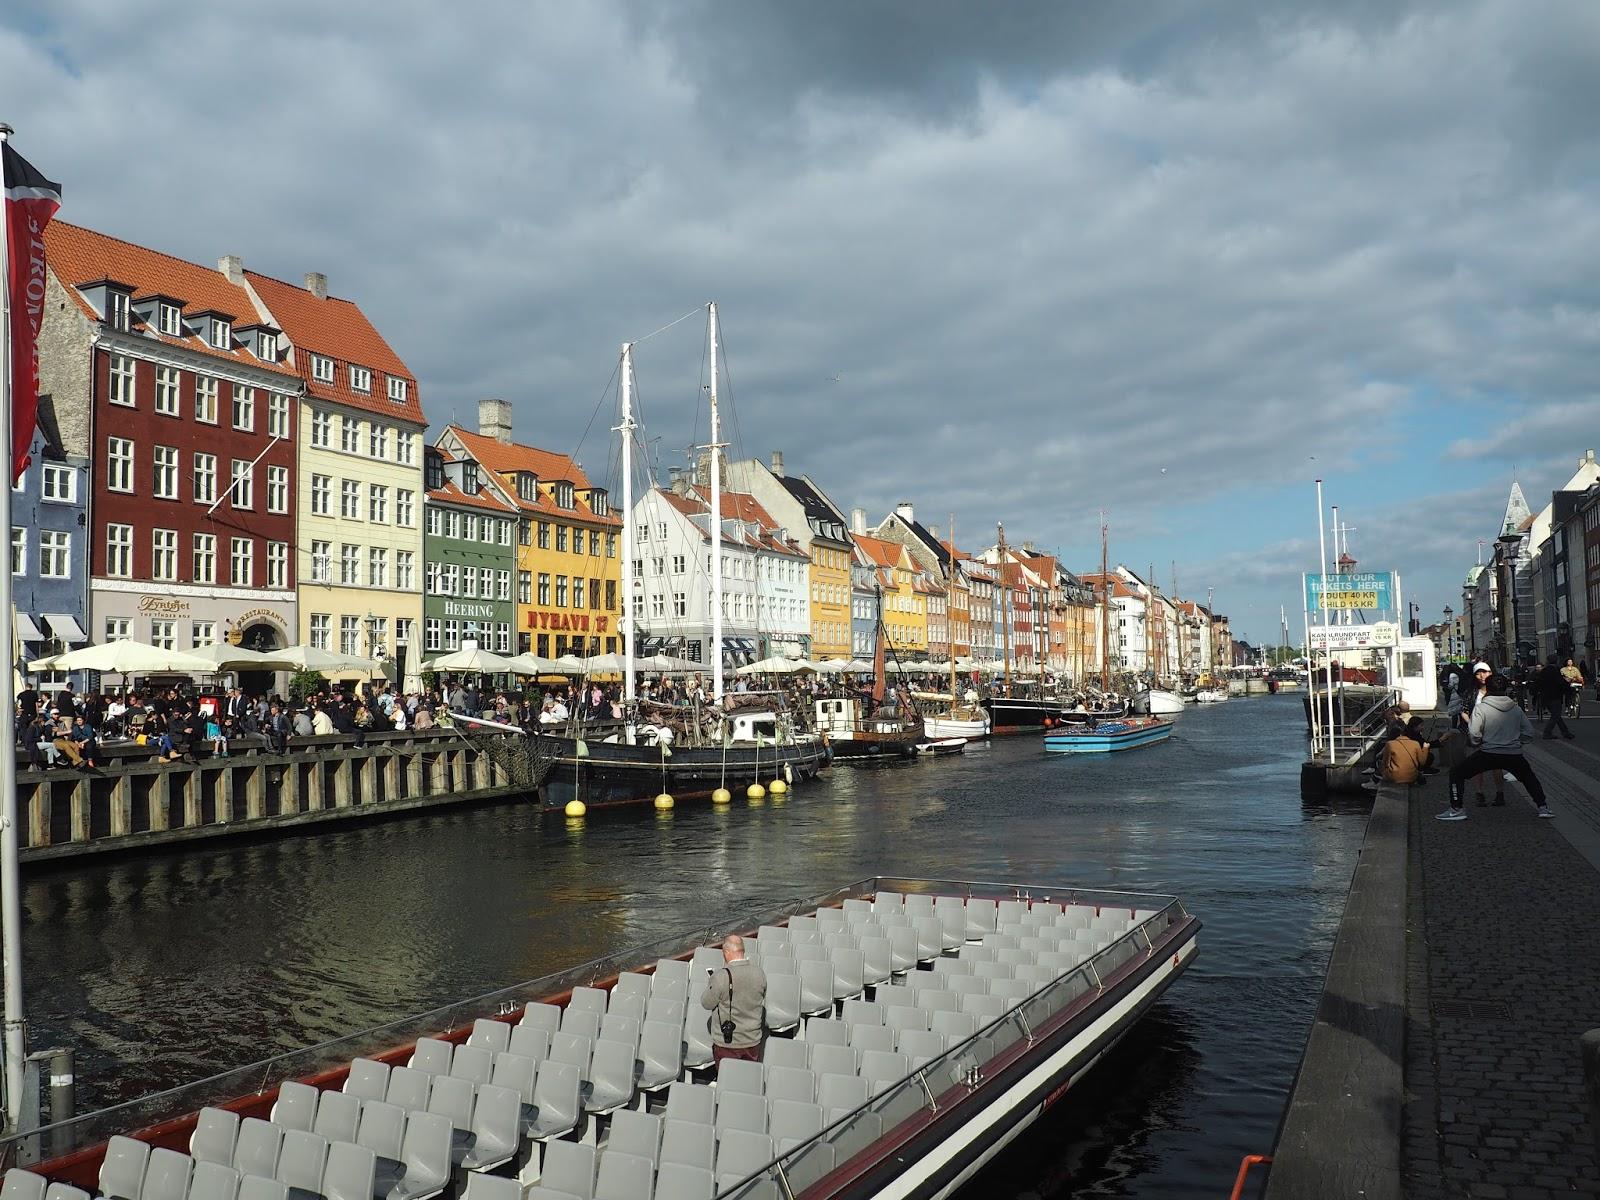 Boats at Nyhavn, Copenhagen